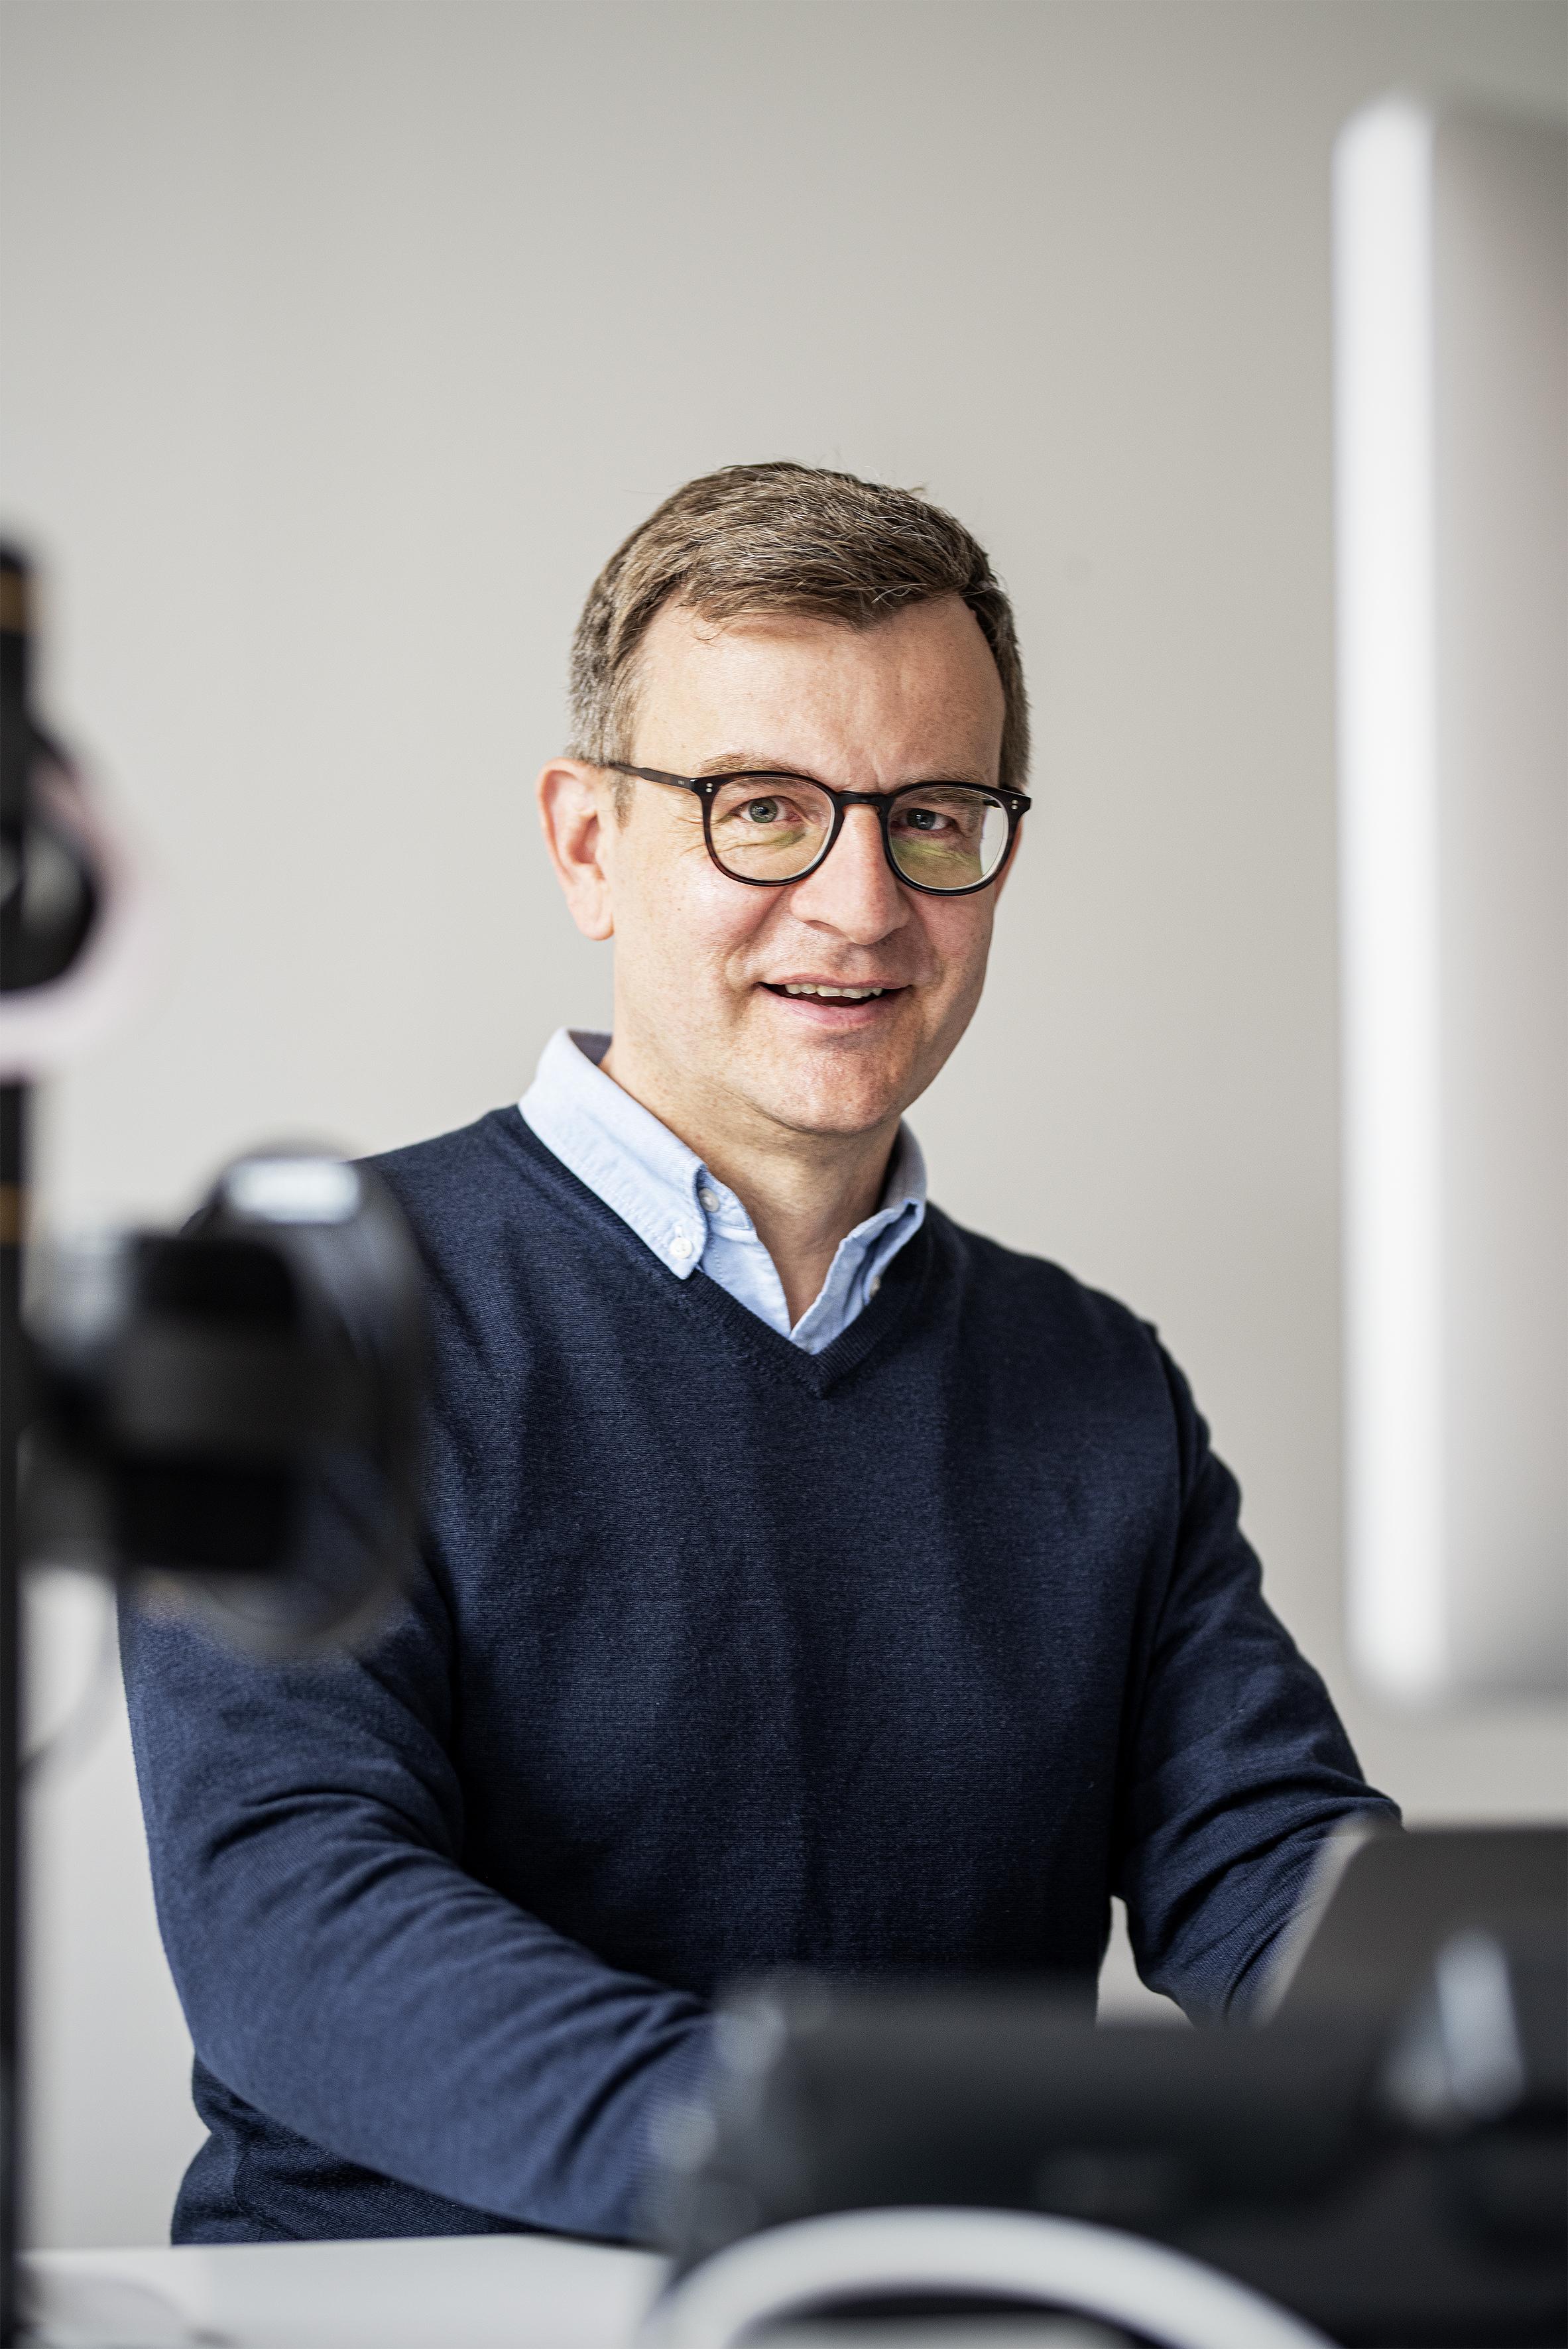 Portrait von Kai Brökelmeier